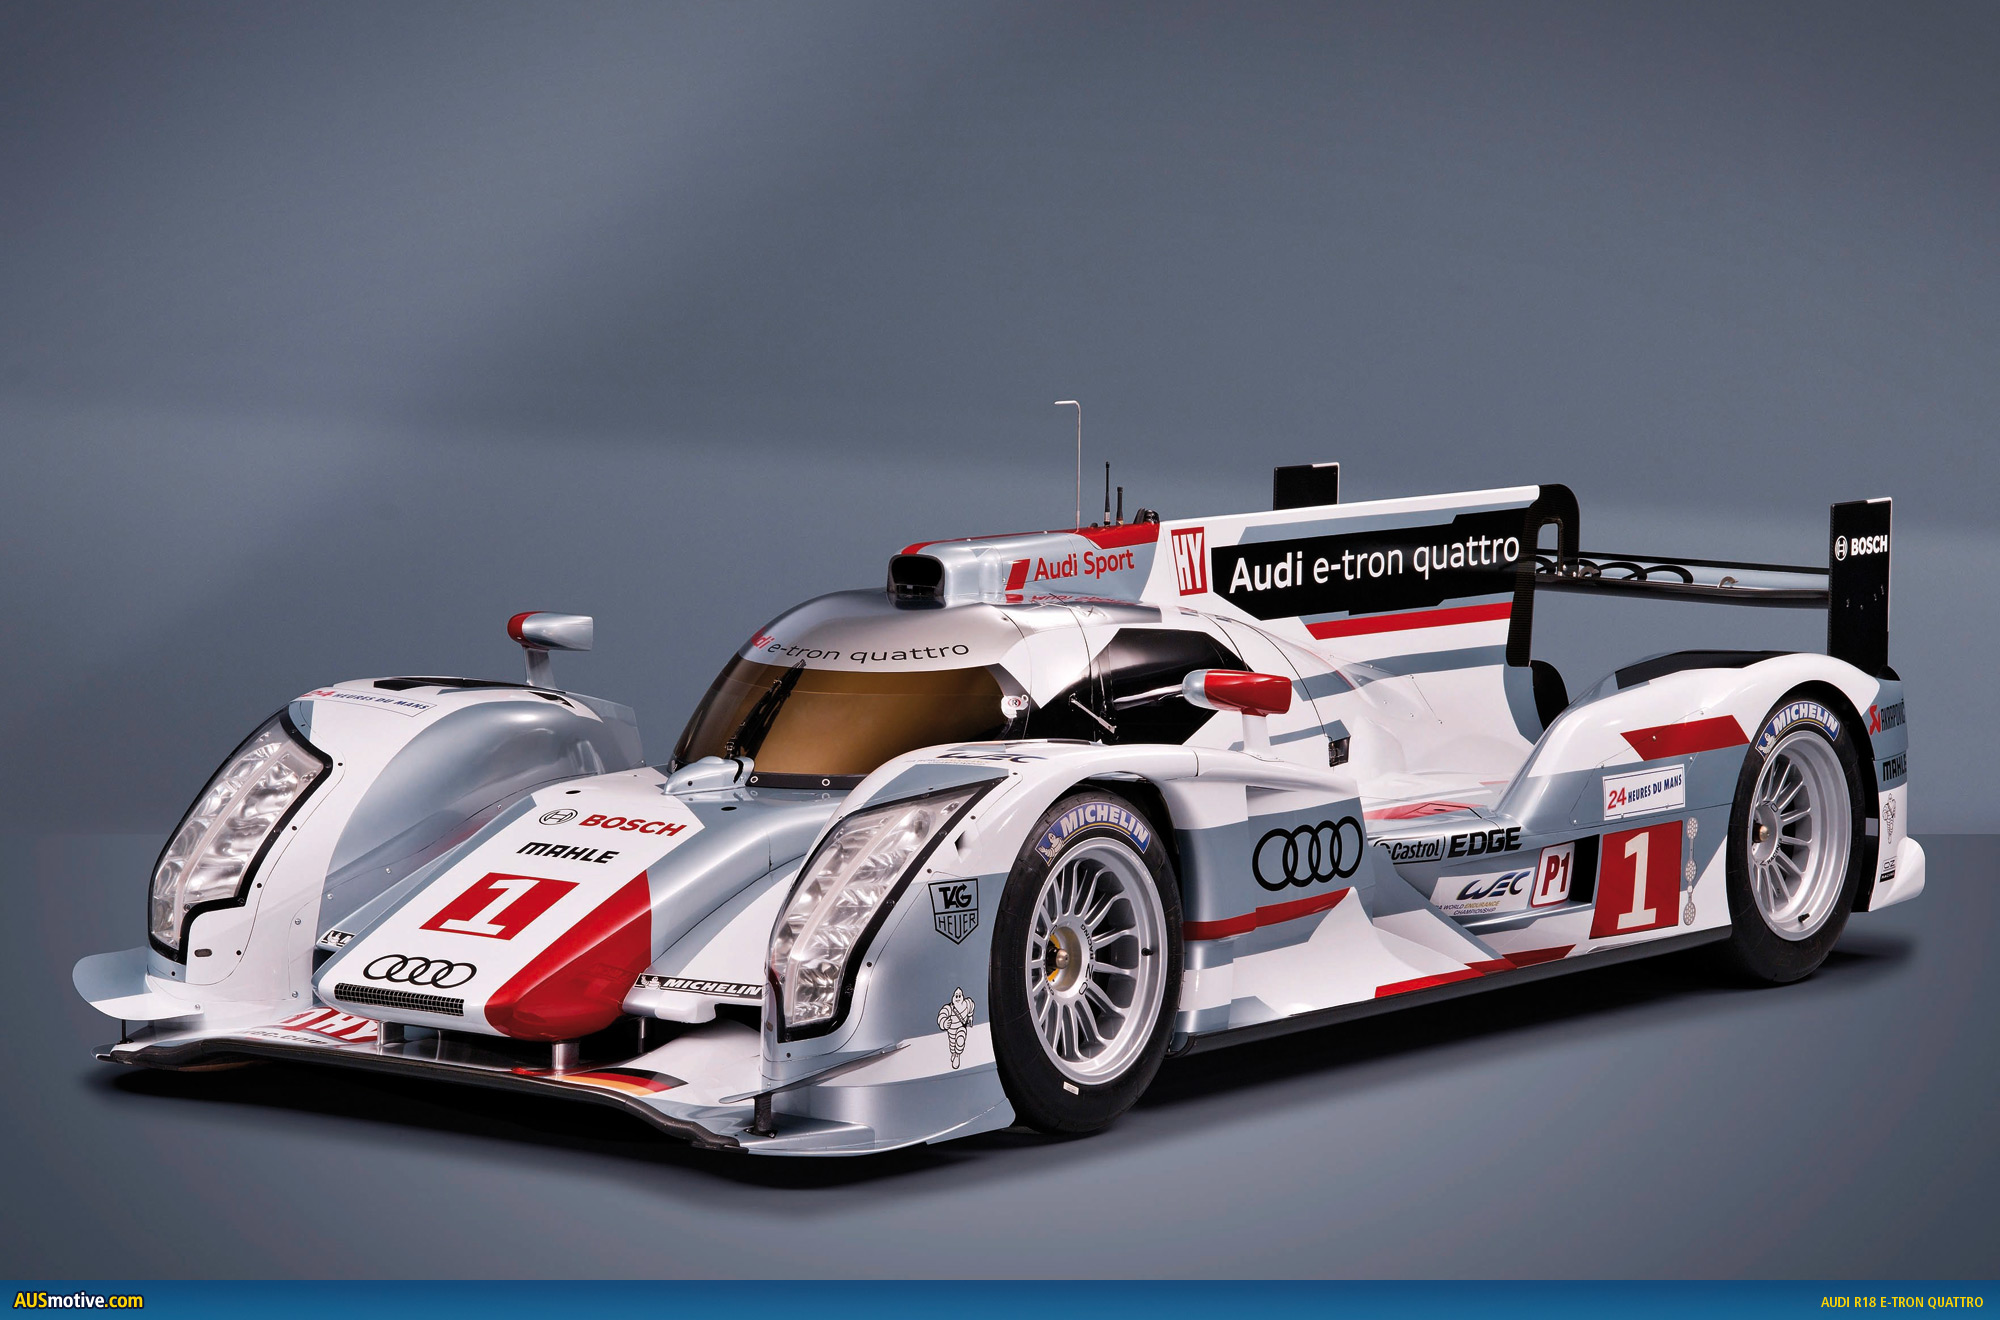 Audi dizel hibrit R18 E-tron quattro ile pole position'da